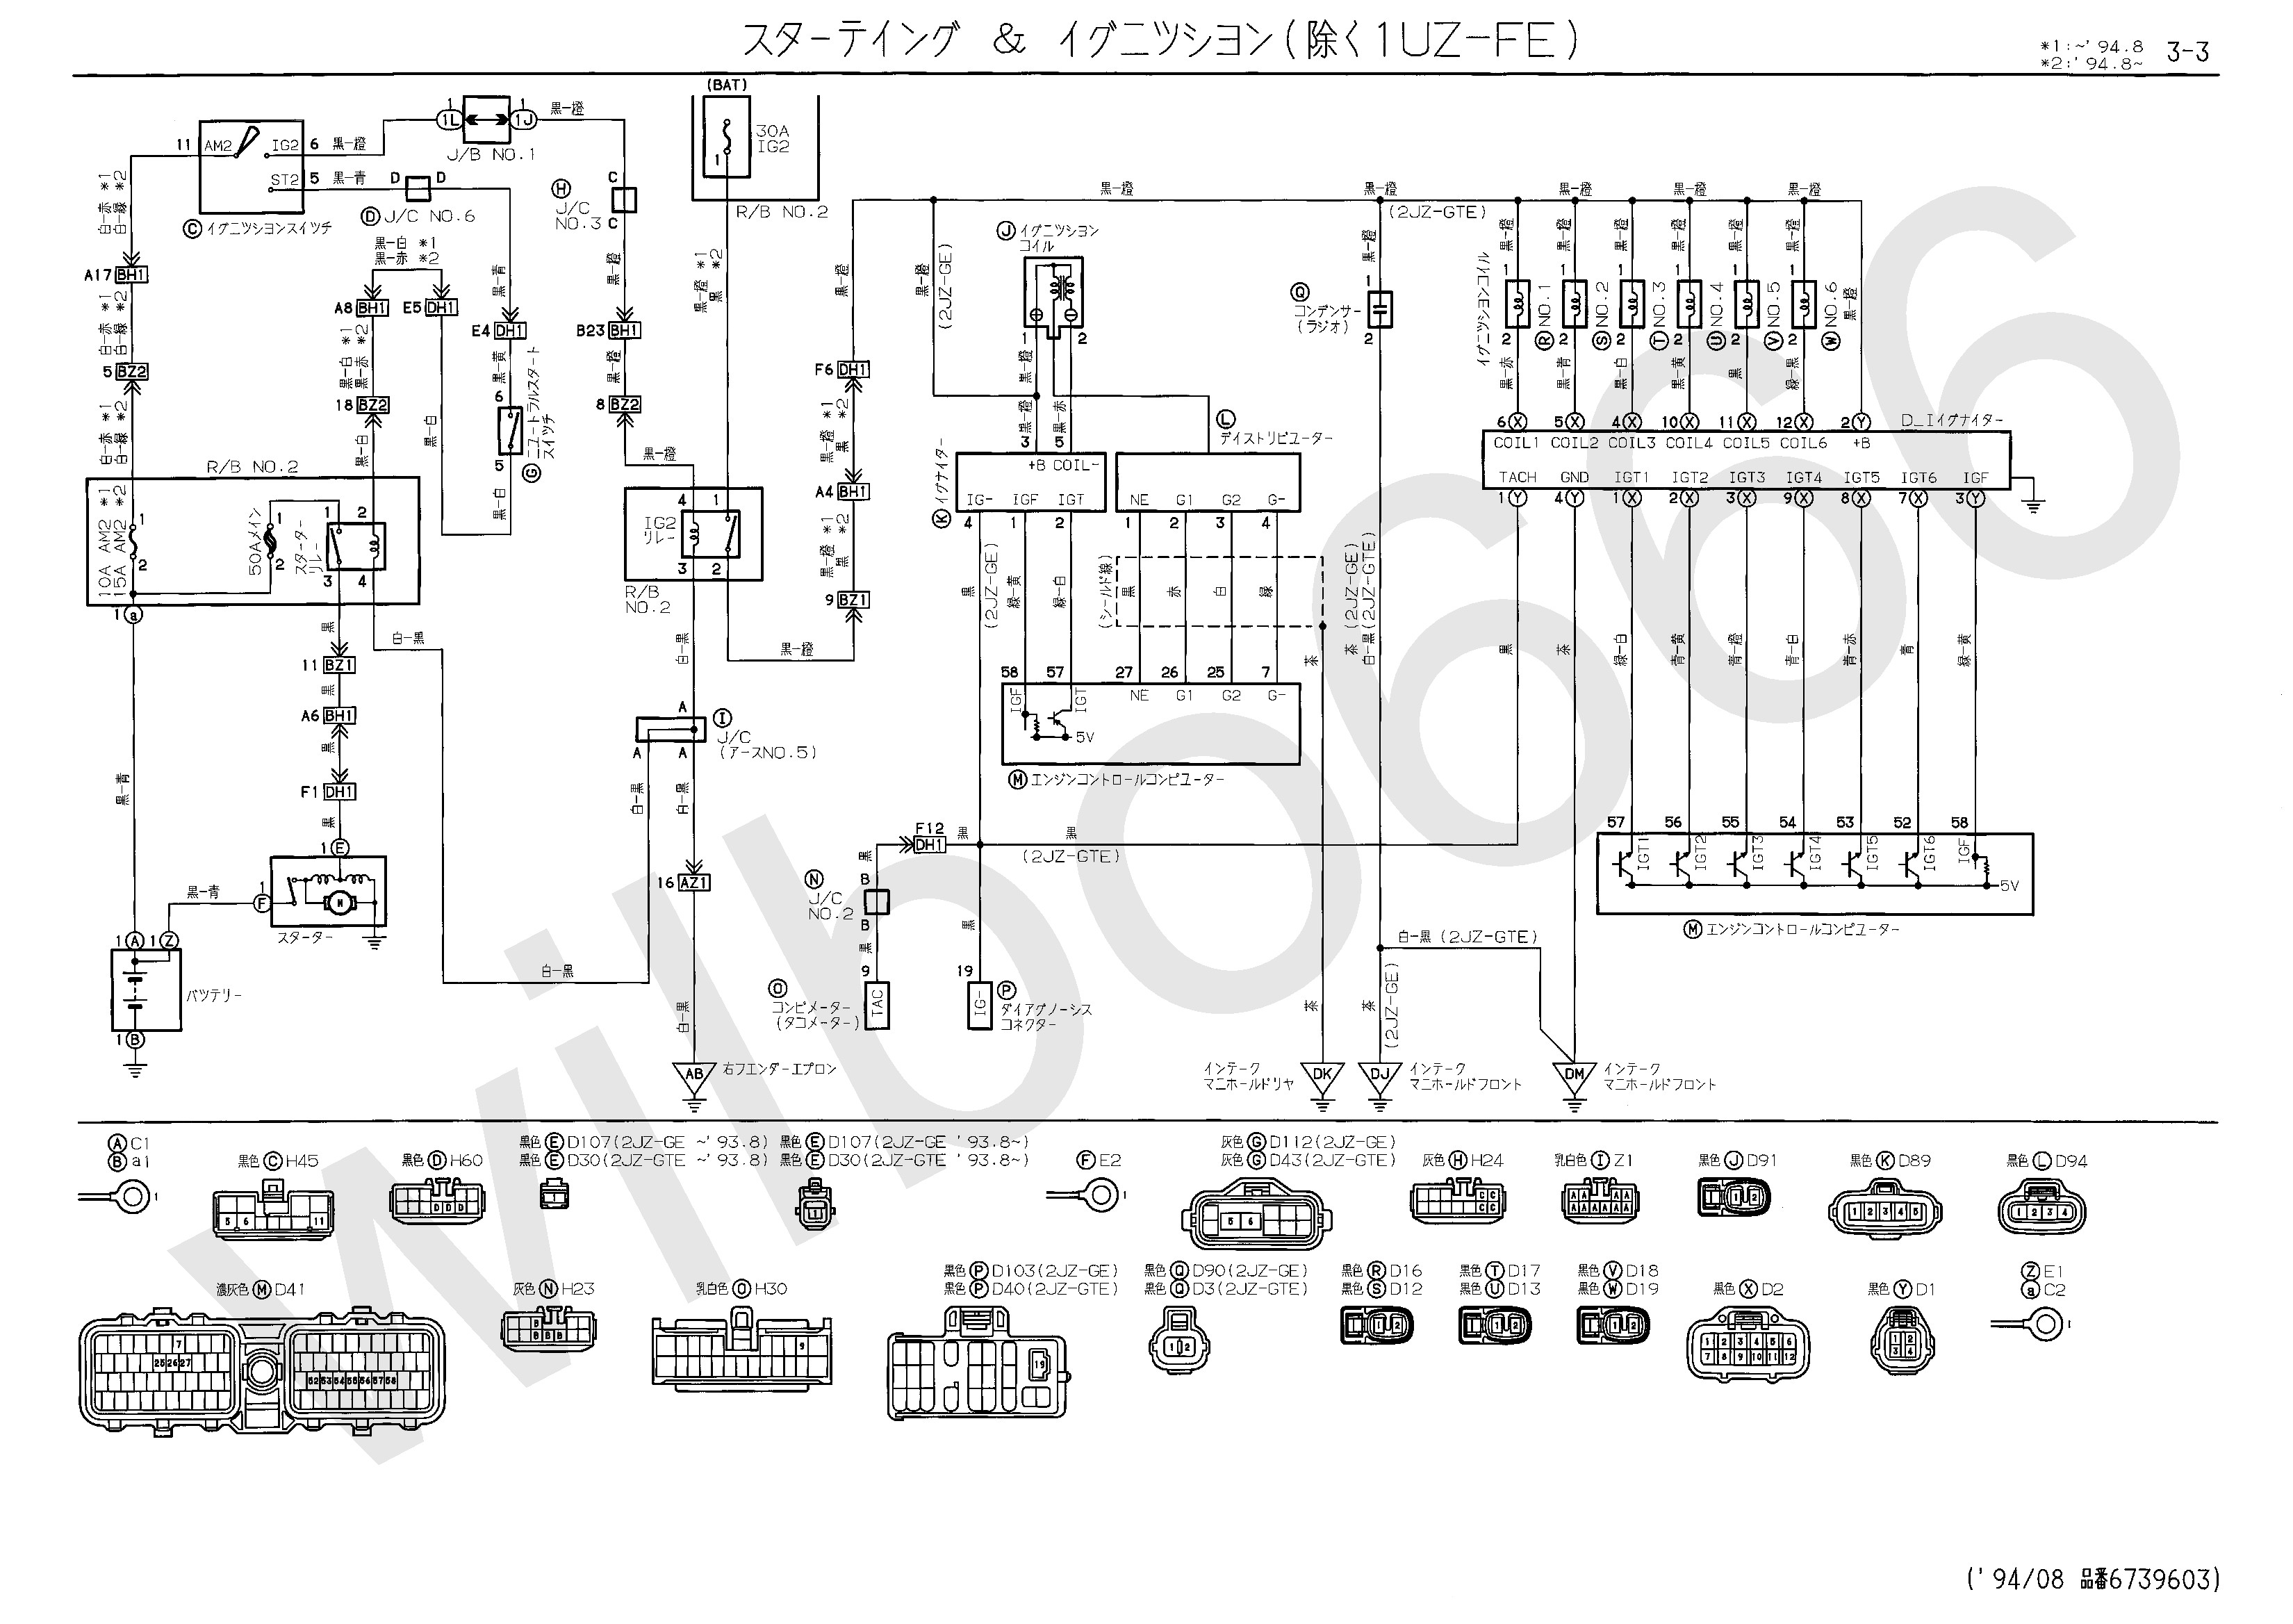 2007 Peterbilt 379 Headlight Wiring Diagram